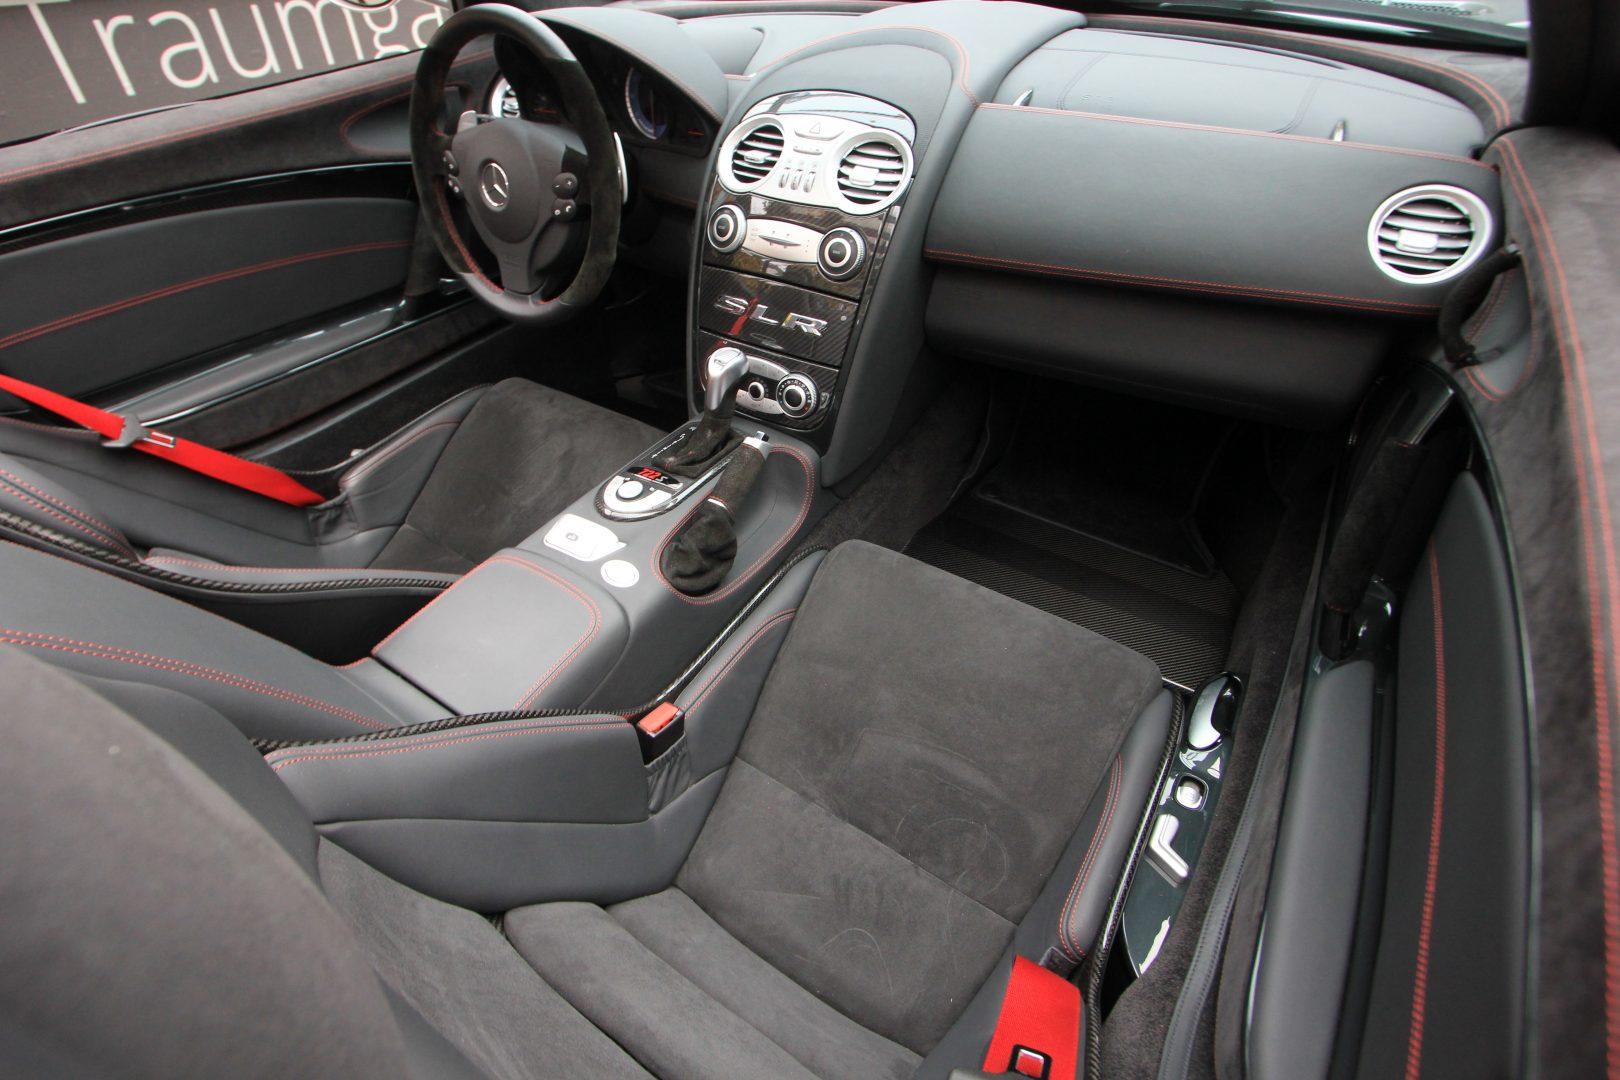 AIL Mercedes-Benz SLR McLaren Roadster 722 S 11